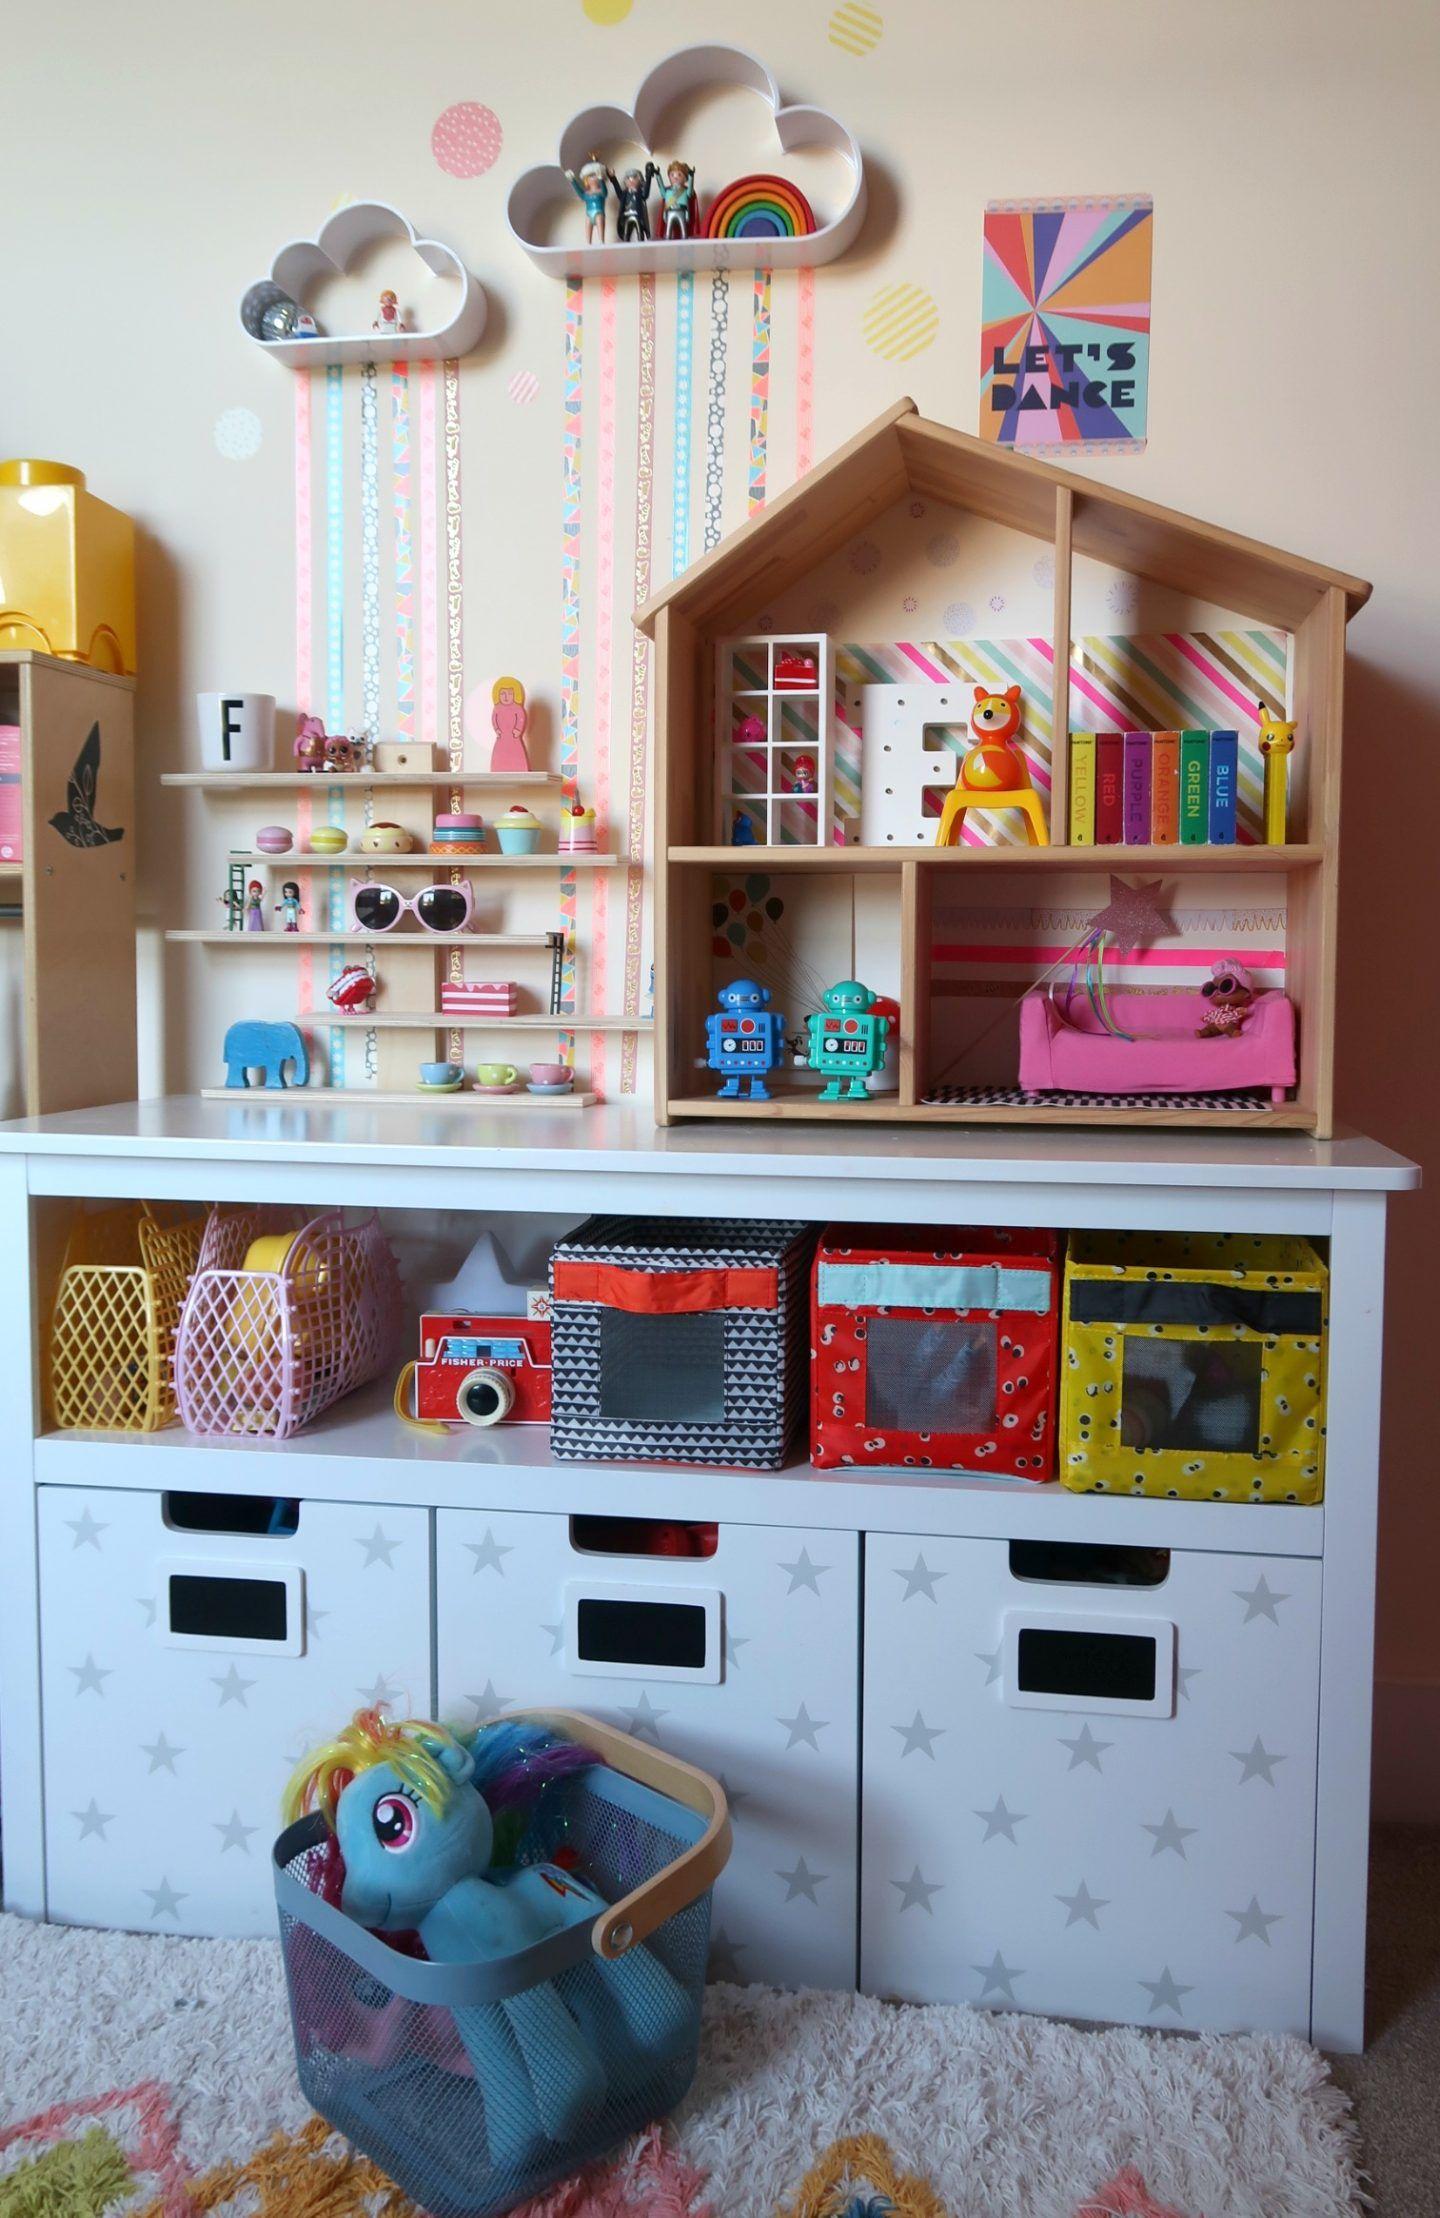 Bookshelves For Kids 5 Children S Book Storage Ideas A Baby On Board Blog In 2021 Kids Book Storage Bookshelves Kids Childrens Furniture